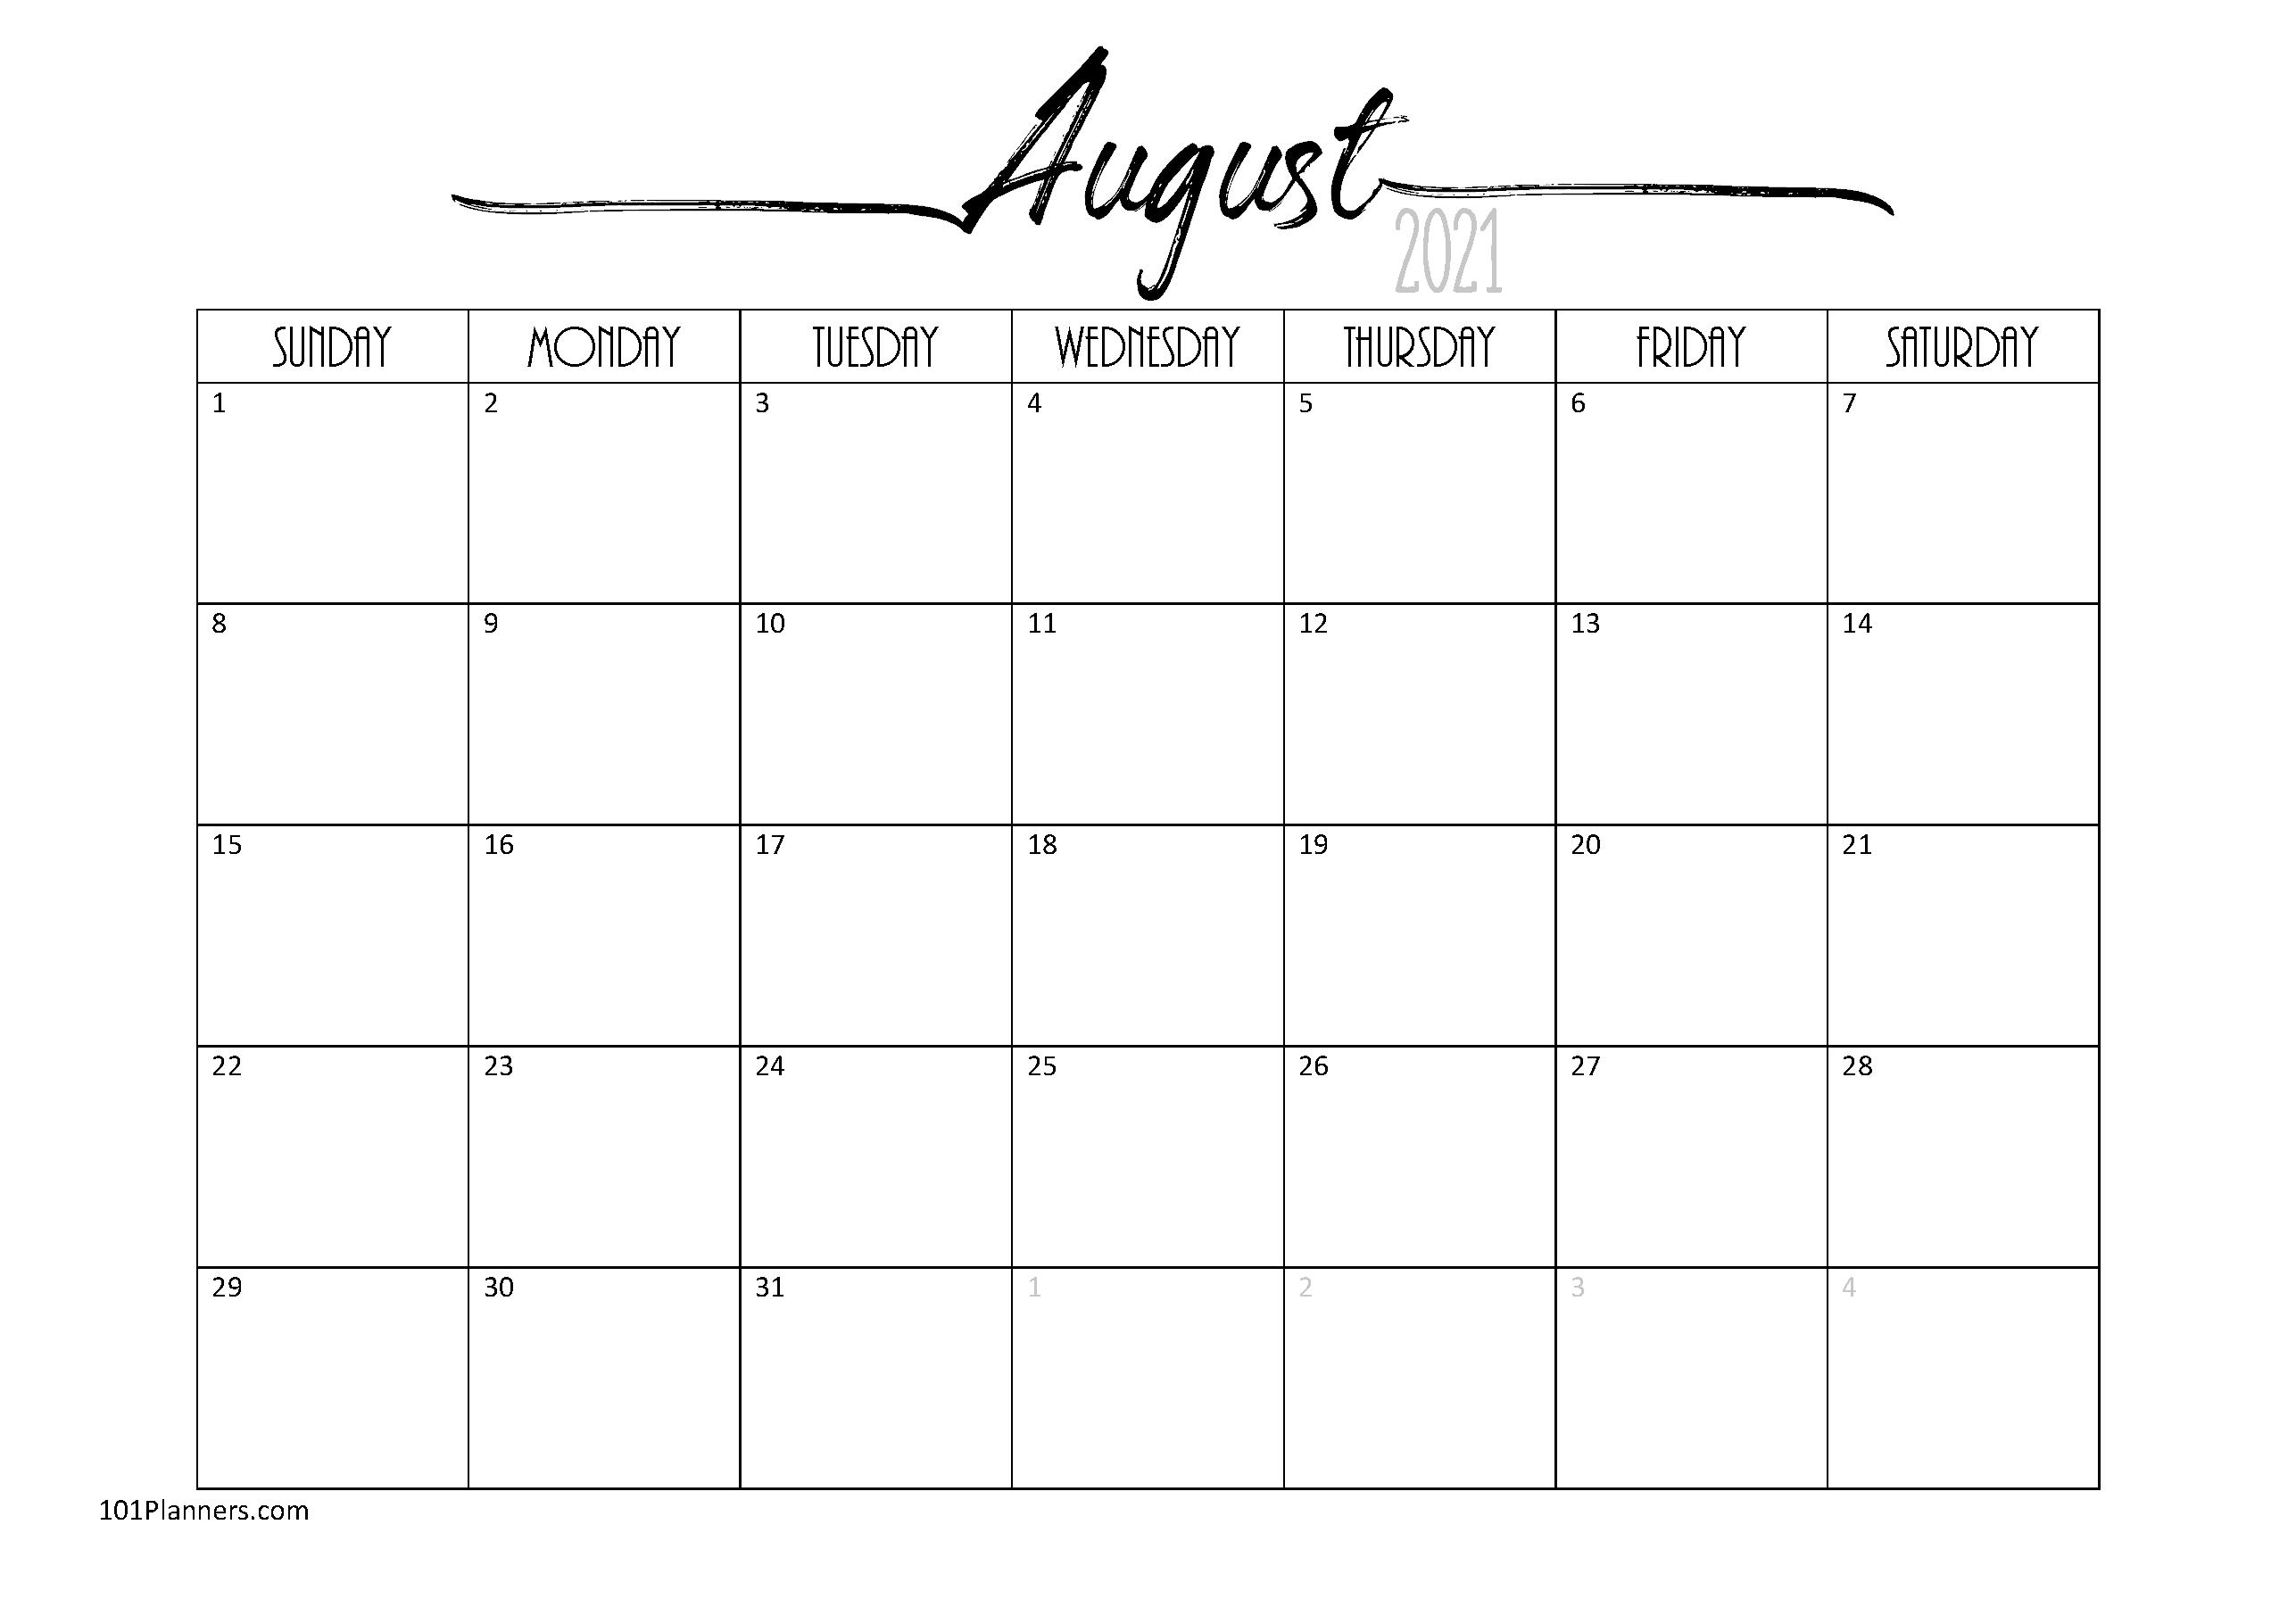 August 2021 Calendar Word Free Printable August 2021 Calendar